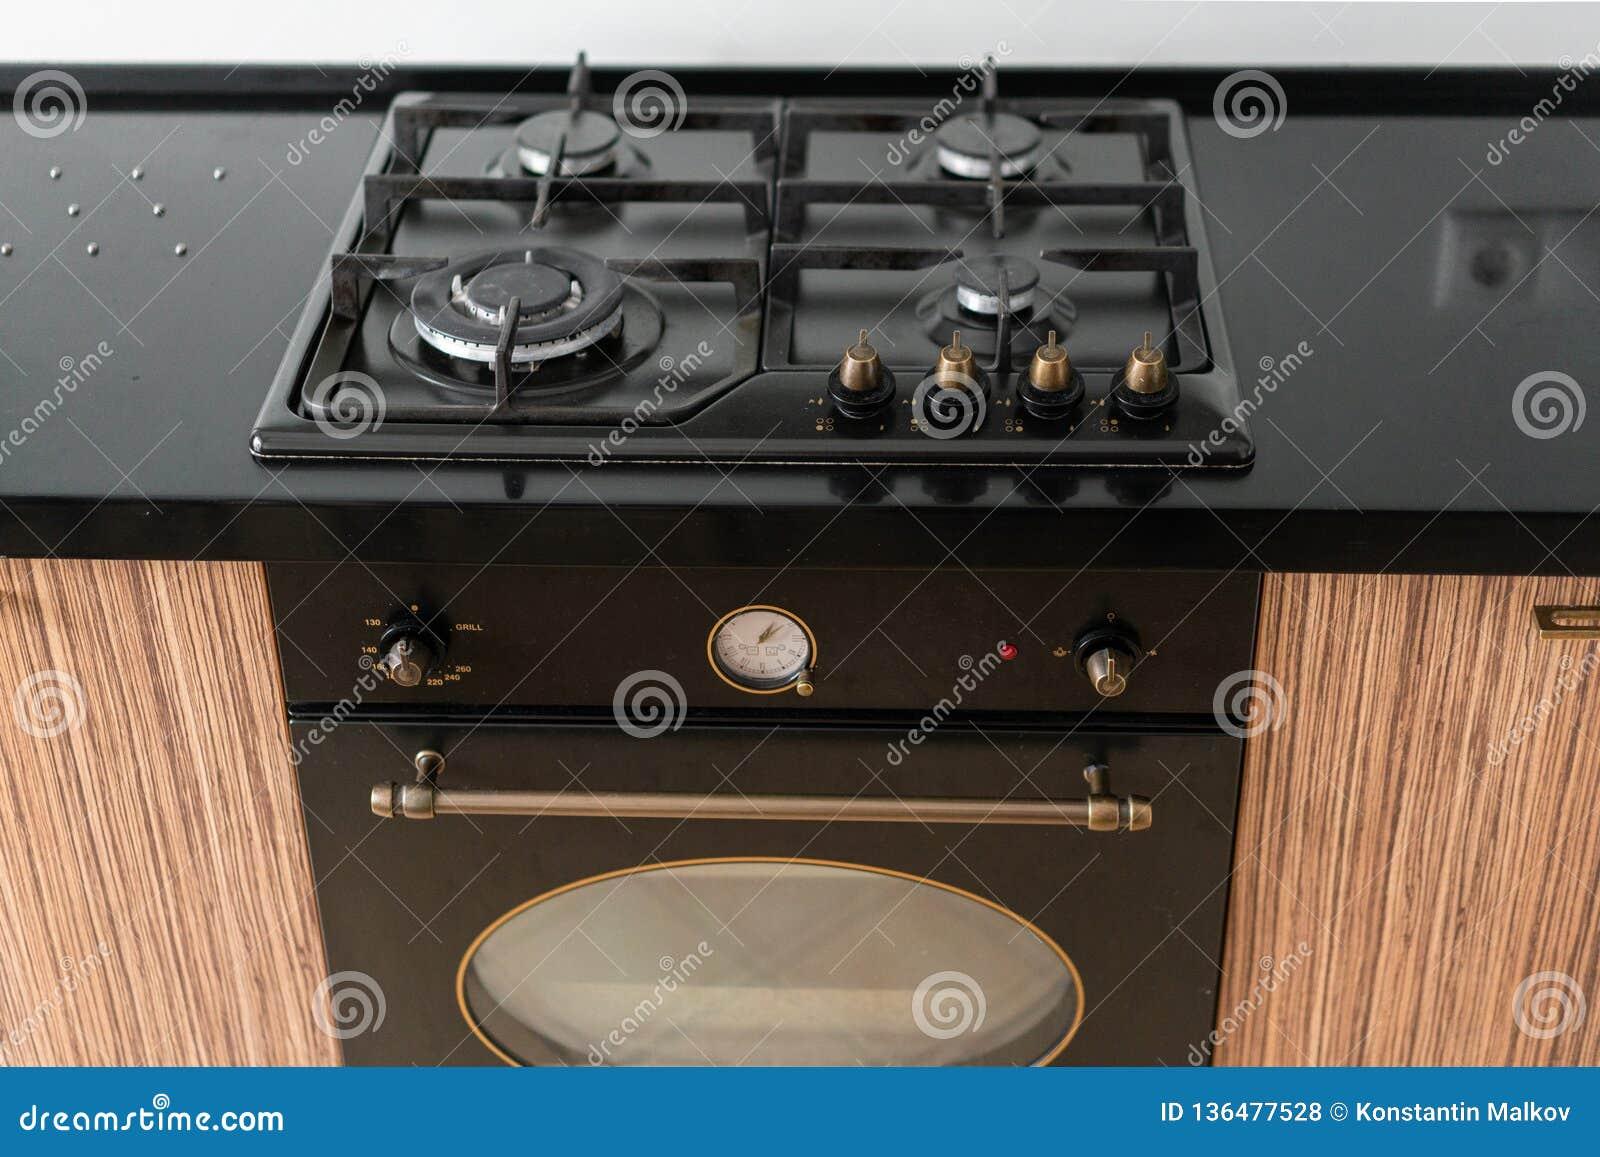 Modern Gas Burner And Hob On A Kitchen Range, Oven. Dark ...